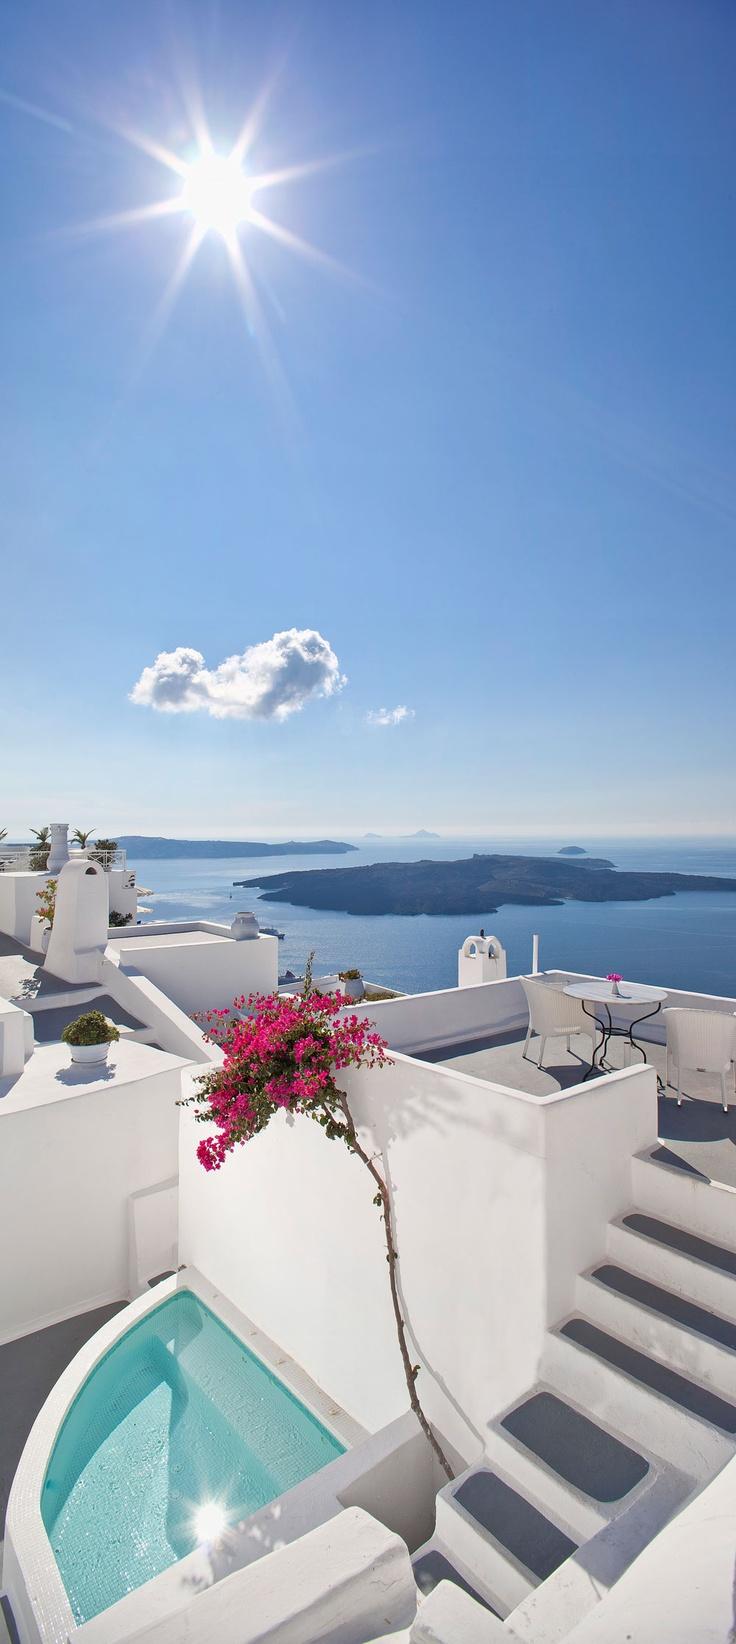 Santorini, Greece / Cliff Side Hotel, Suites in Firostefani